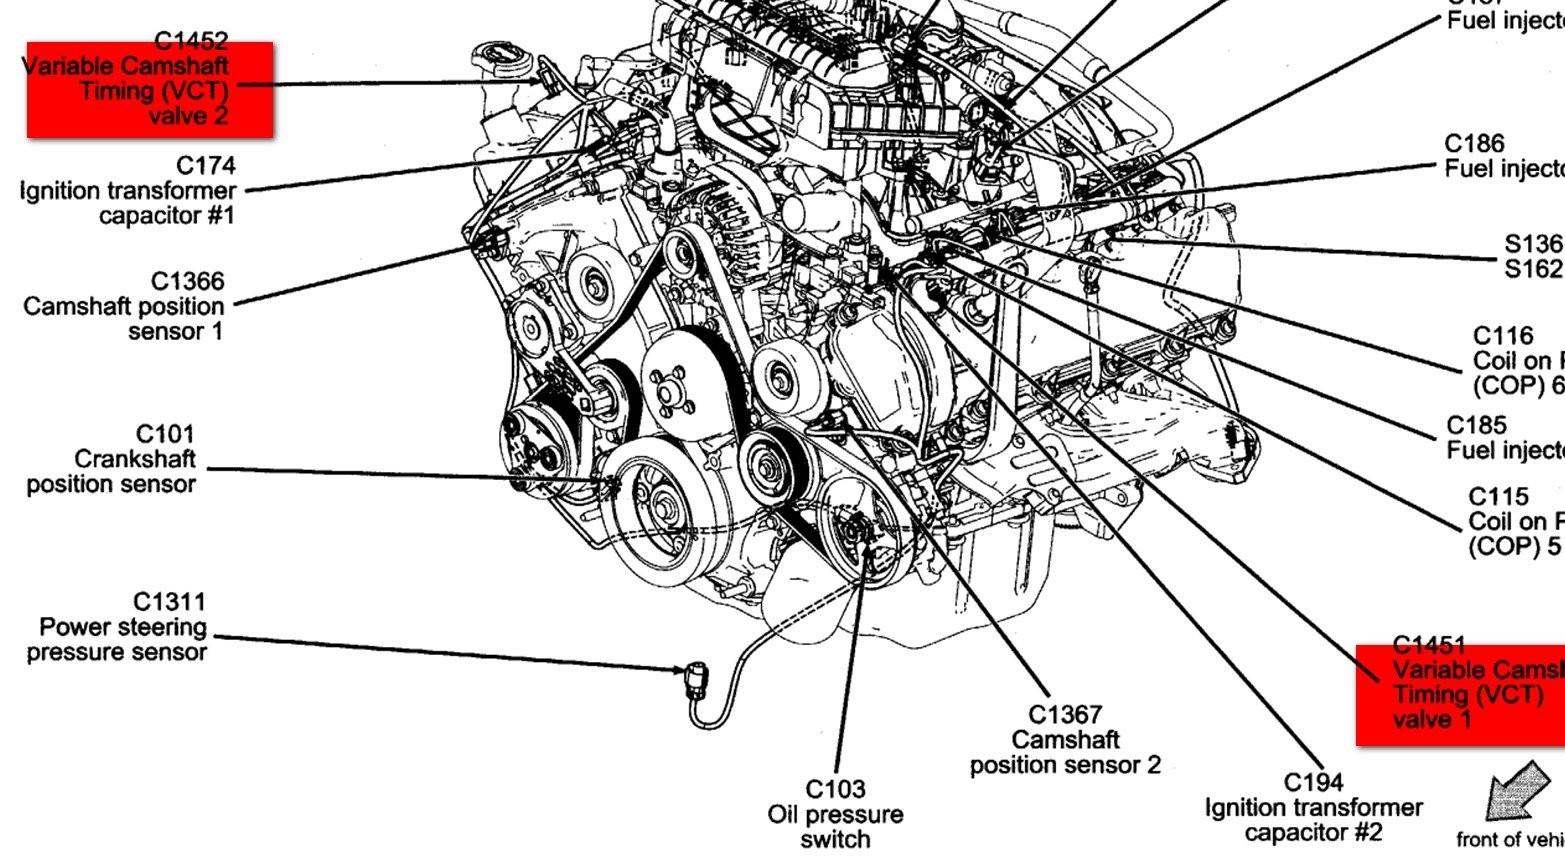 2005 ford 5.4 Engine Wiring Harness Diagram ford 5 4 Triton Engine Diagram Wire Diagram Here Of 2005 ford 5.4 Engine Wiring Harness Diagram